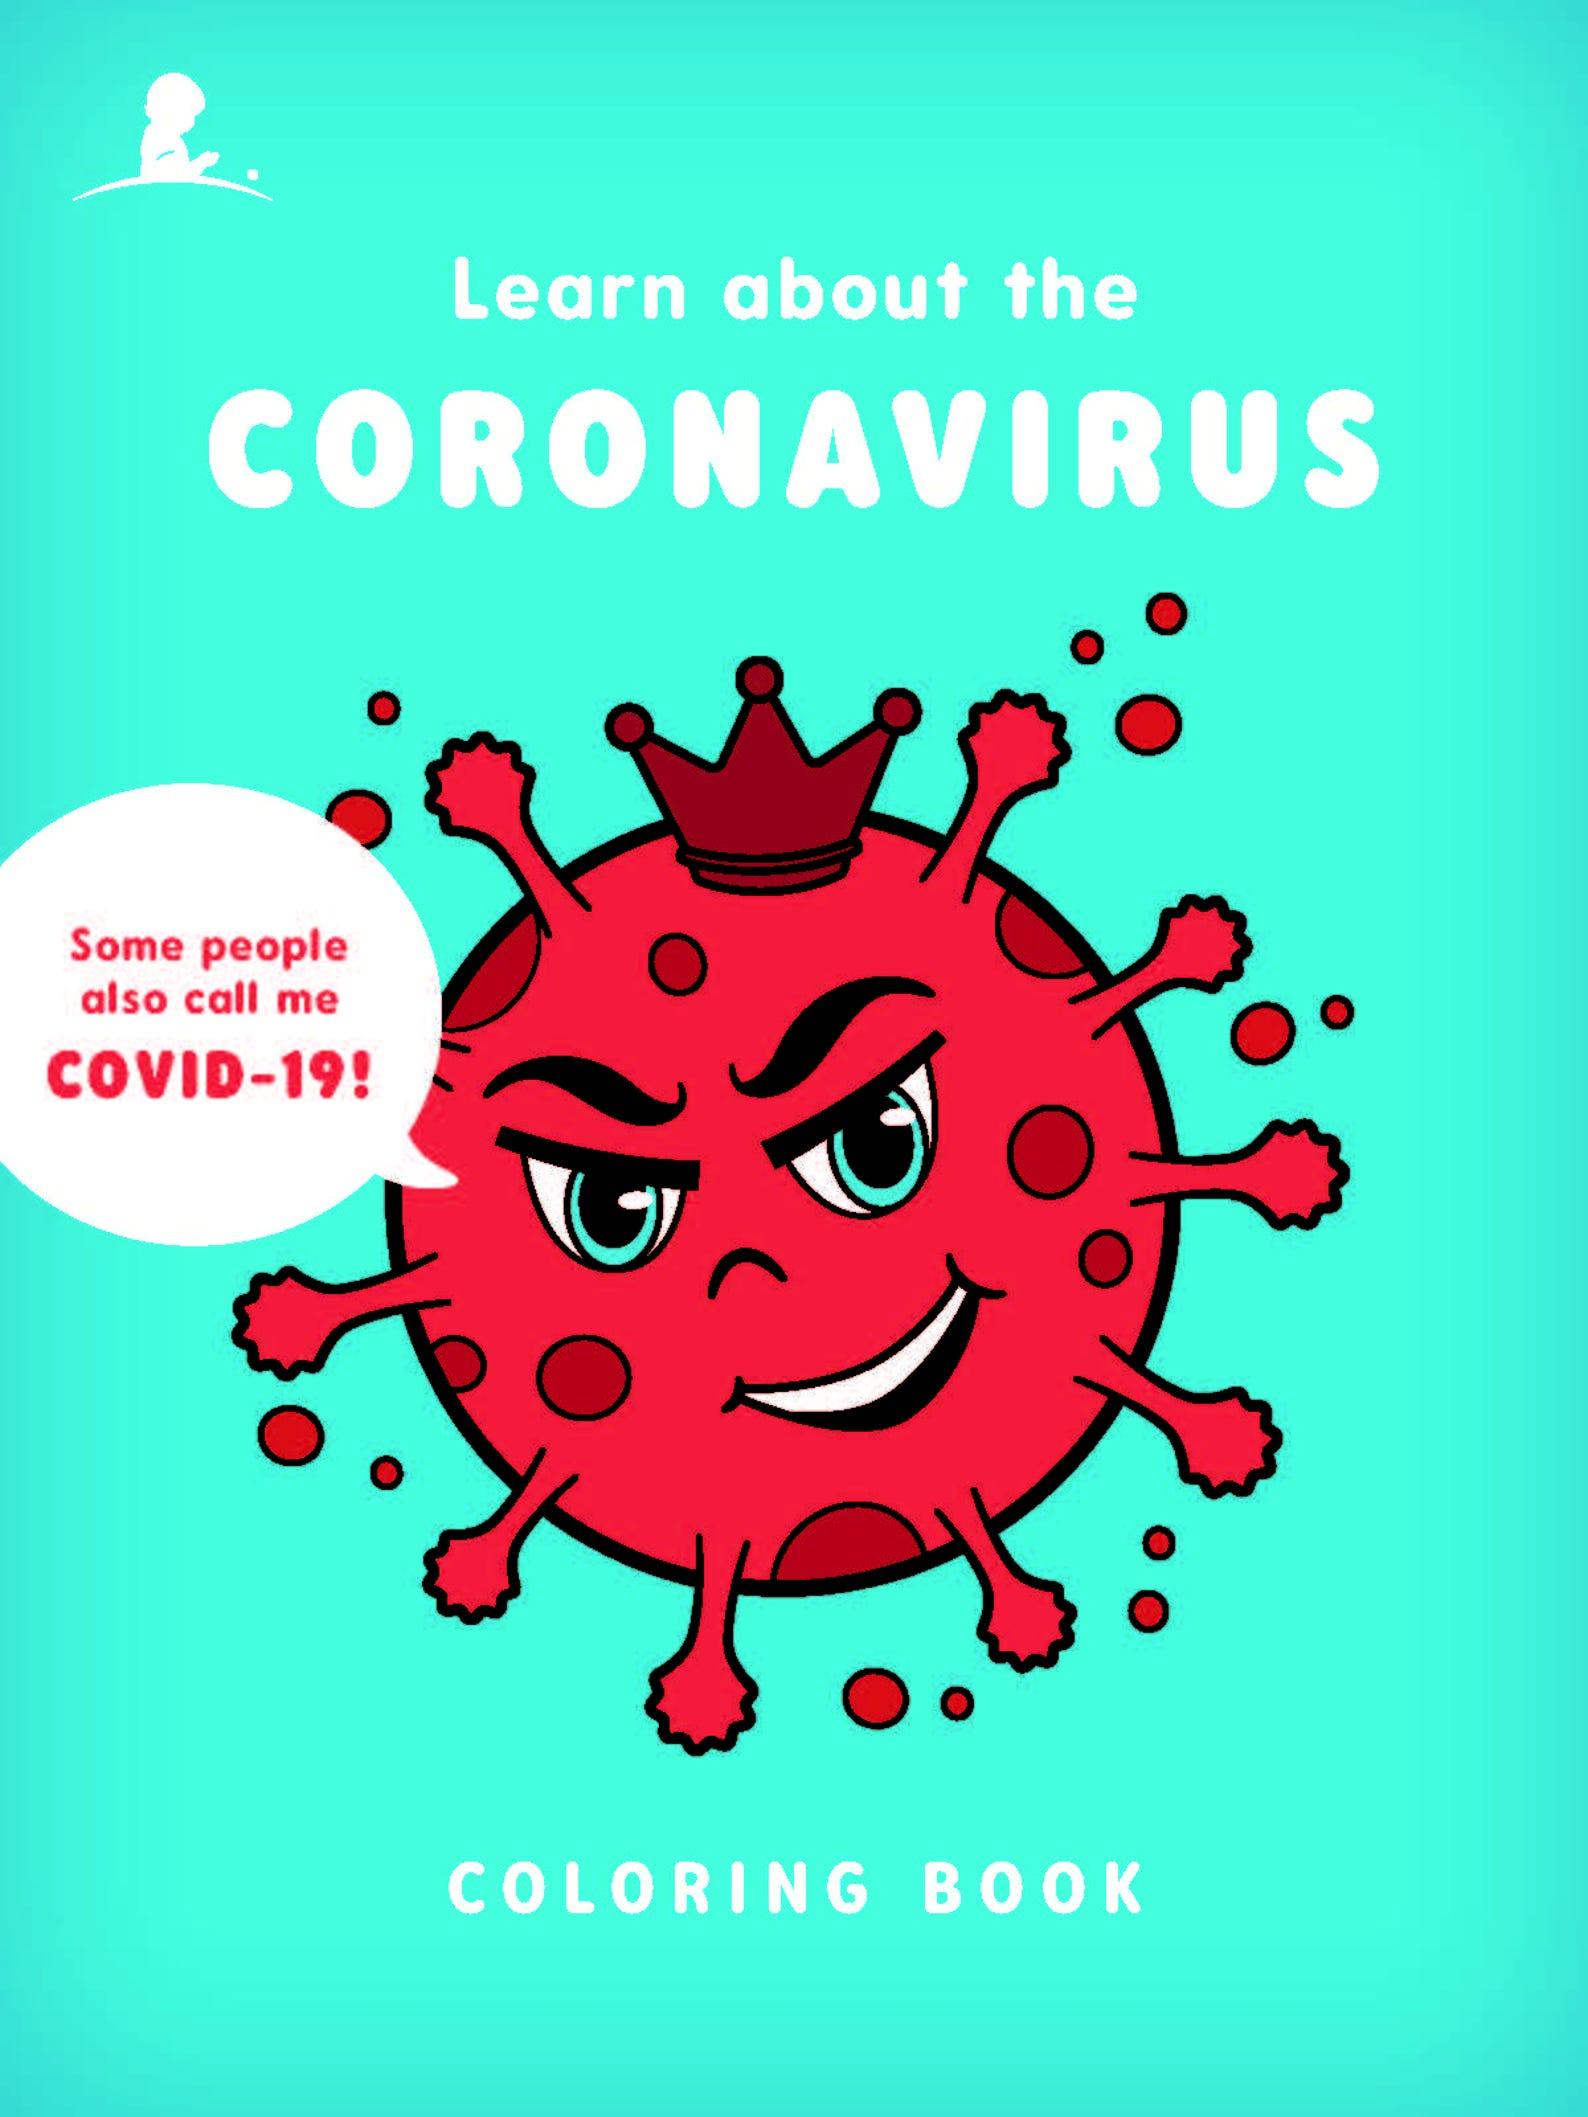 St. Jude Coronavirus coloring book